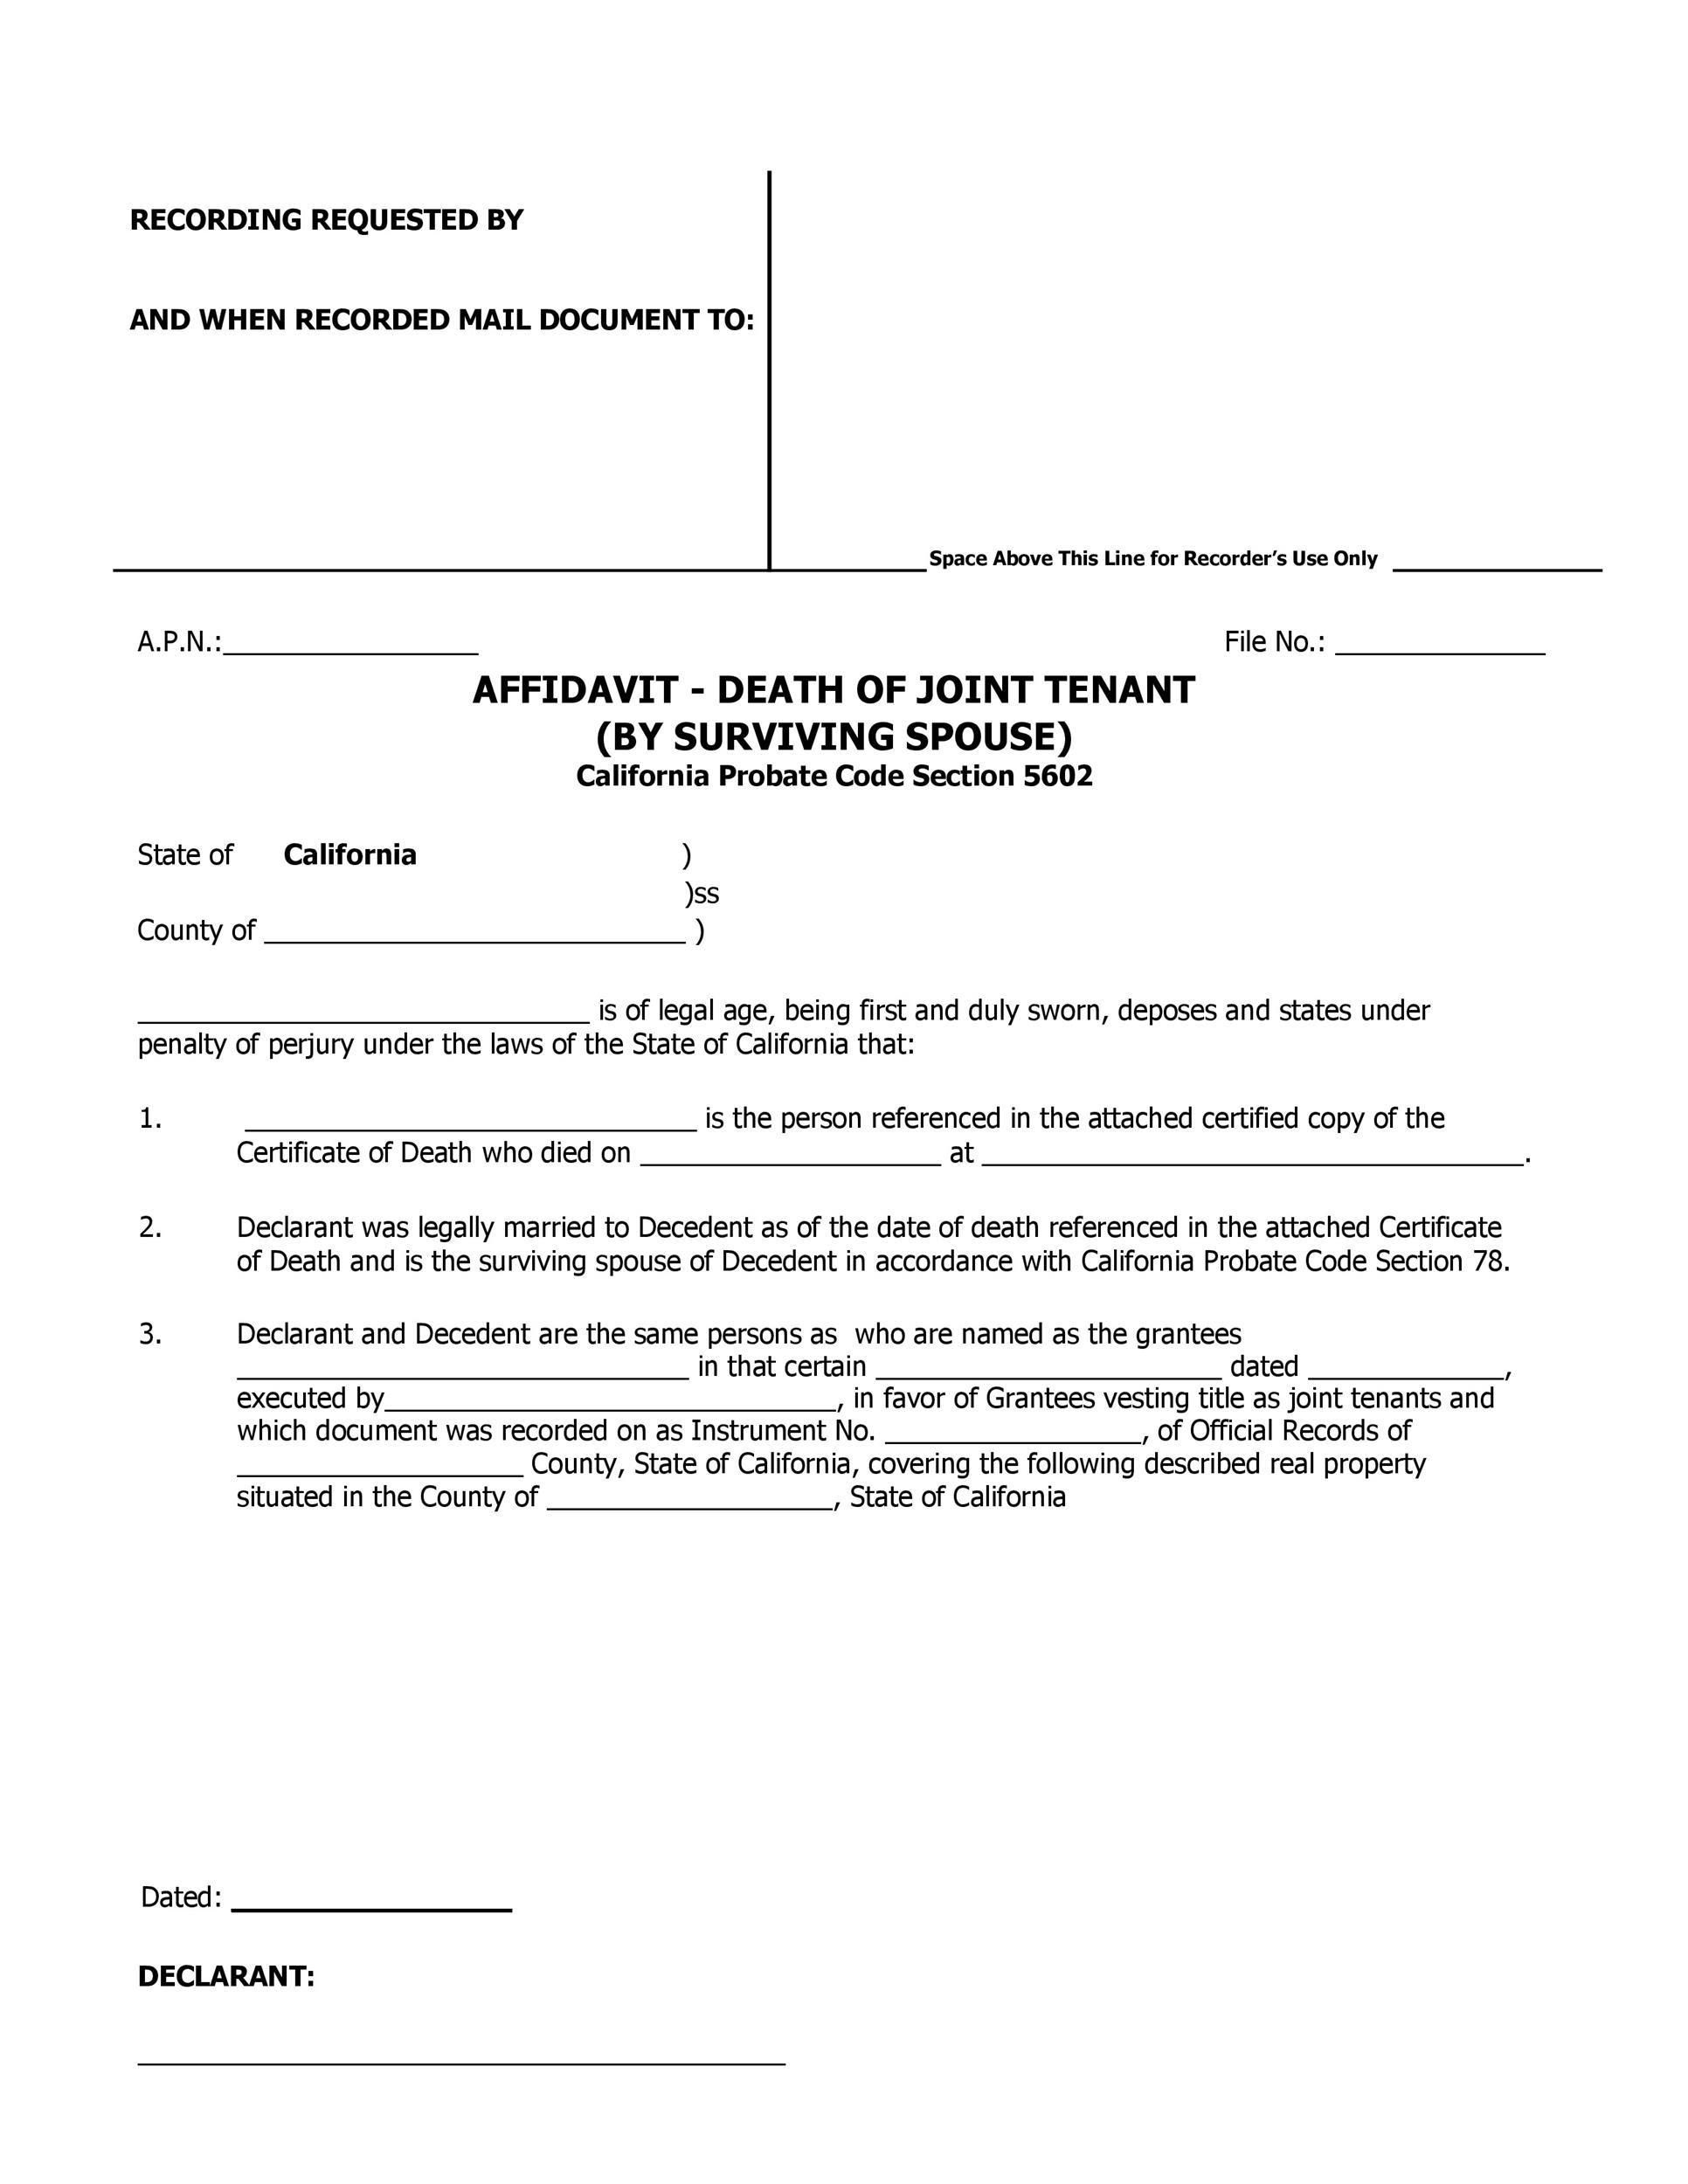 Free affidavit of death 38